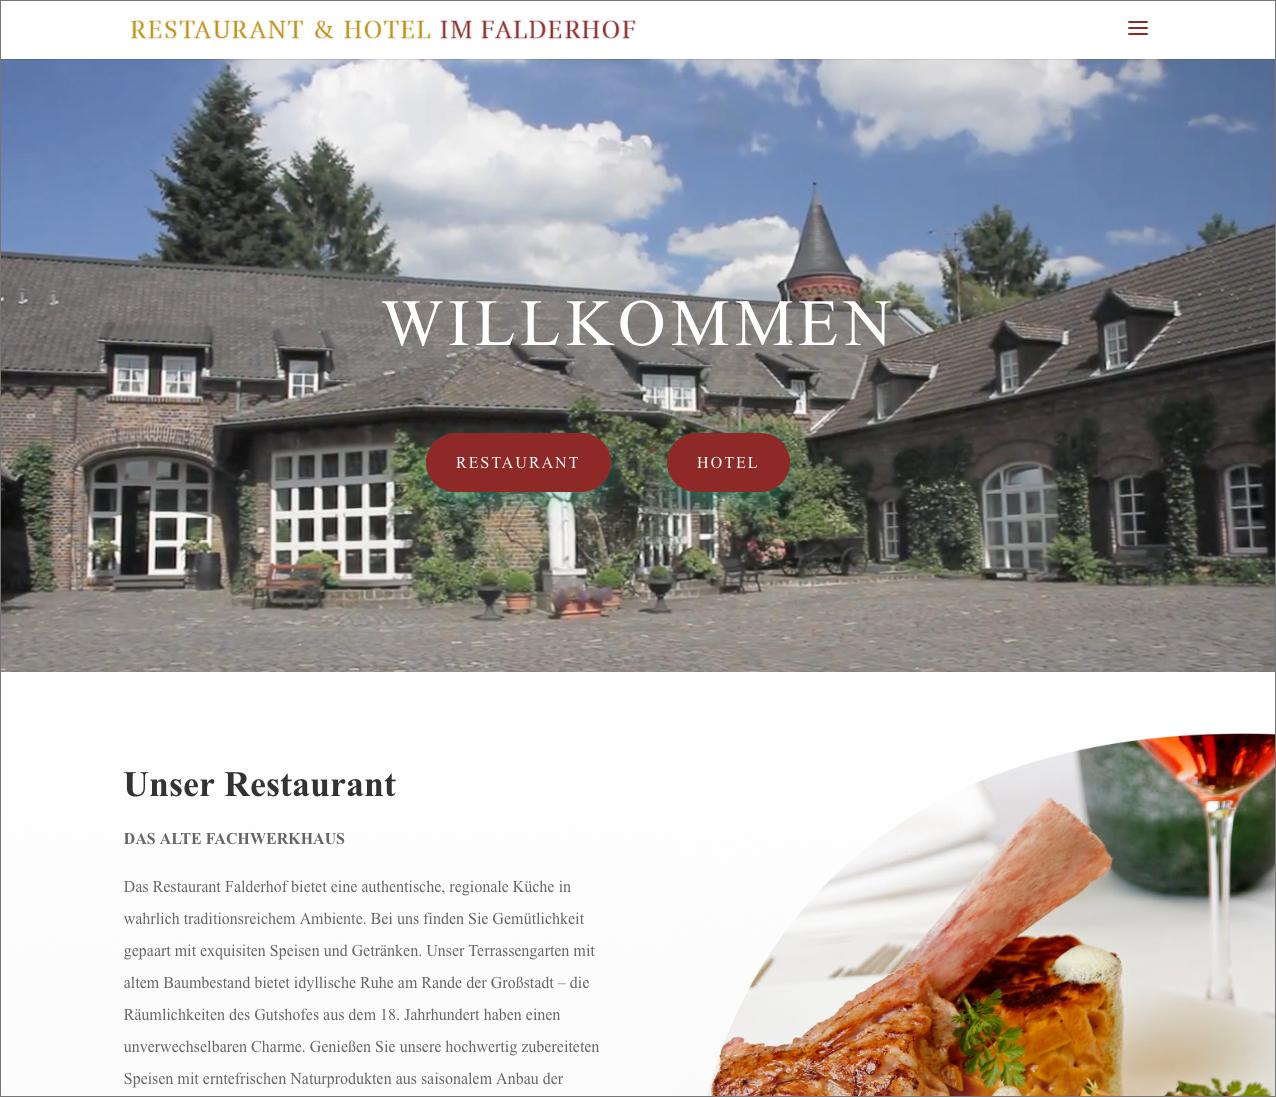 Restaurant & Hotel im Falderhof